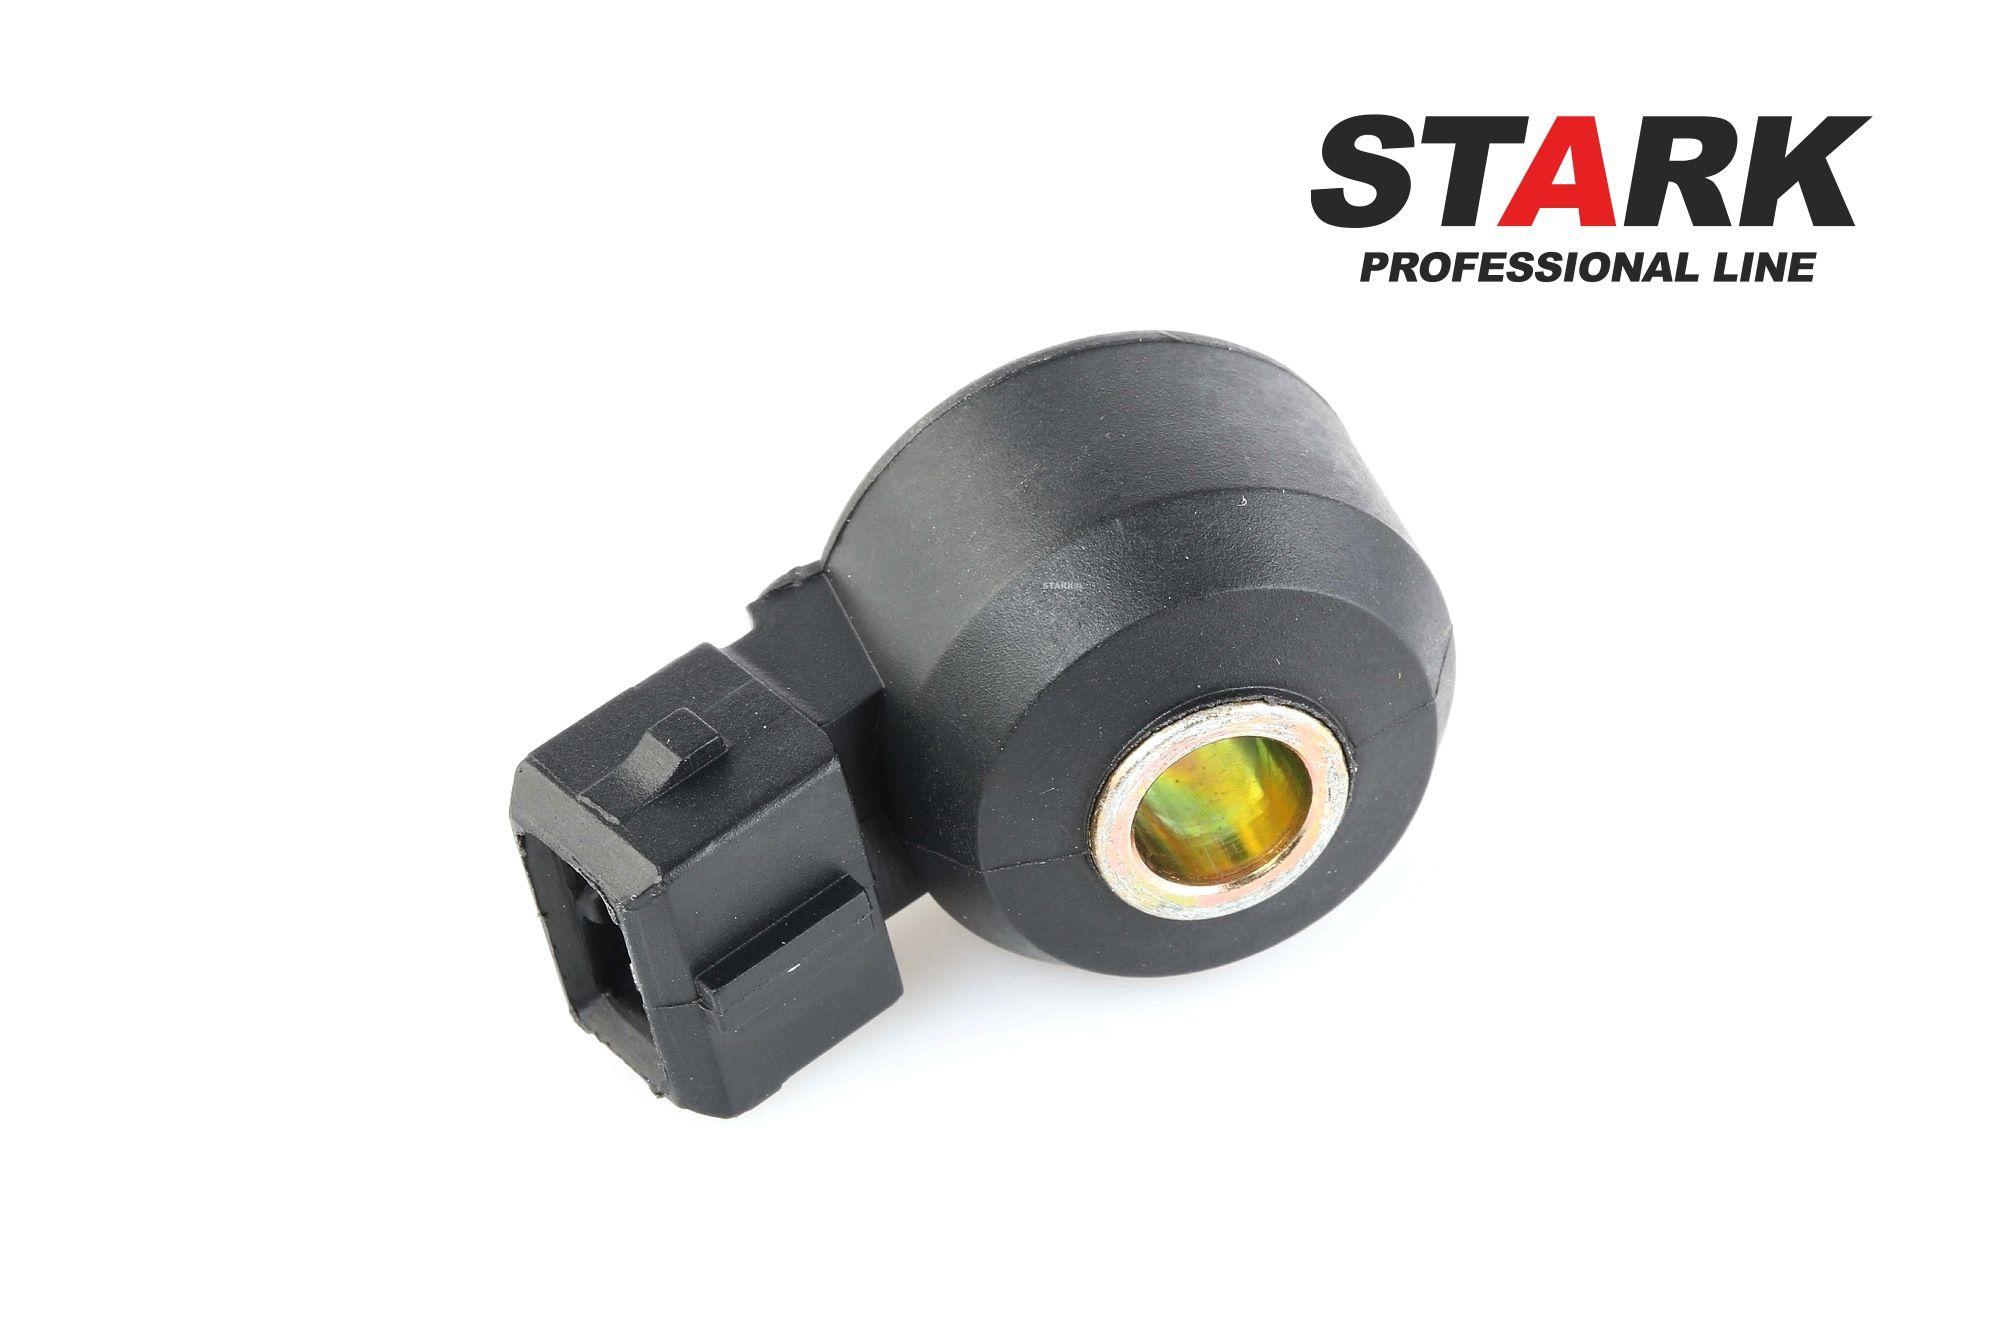 STARK Klopfsensor SKKS-0400023